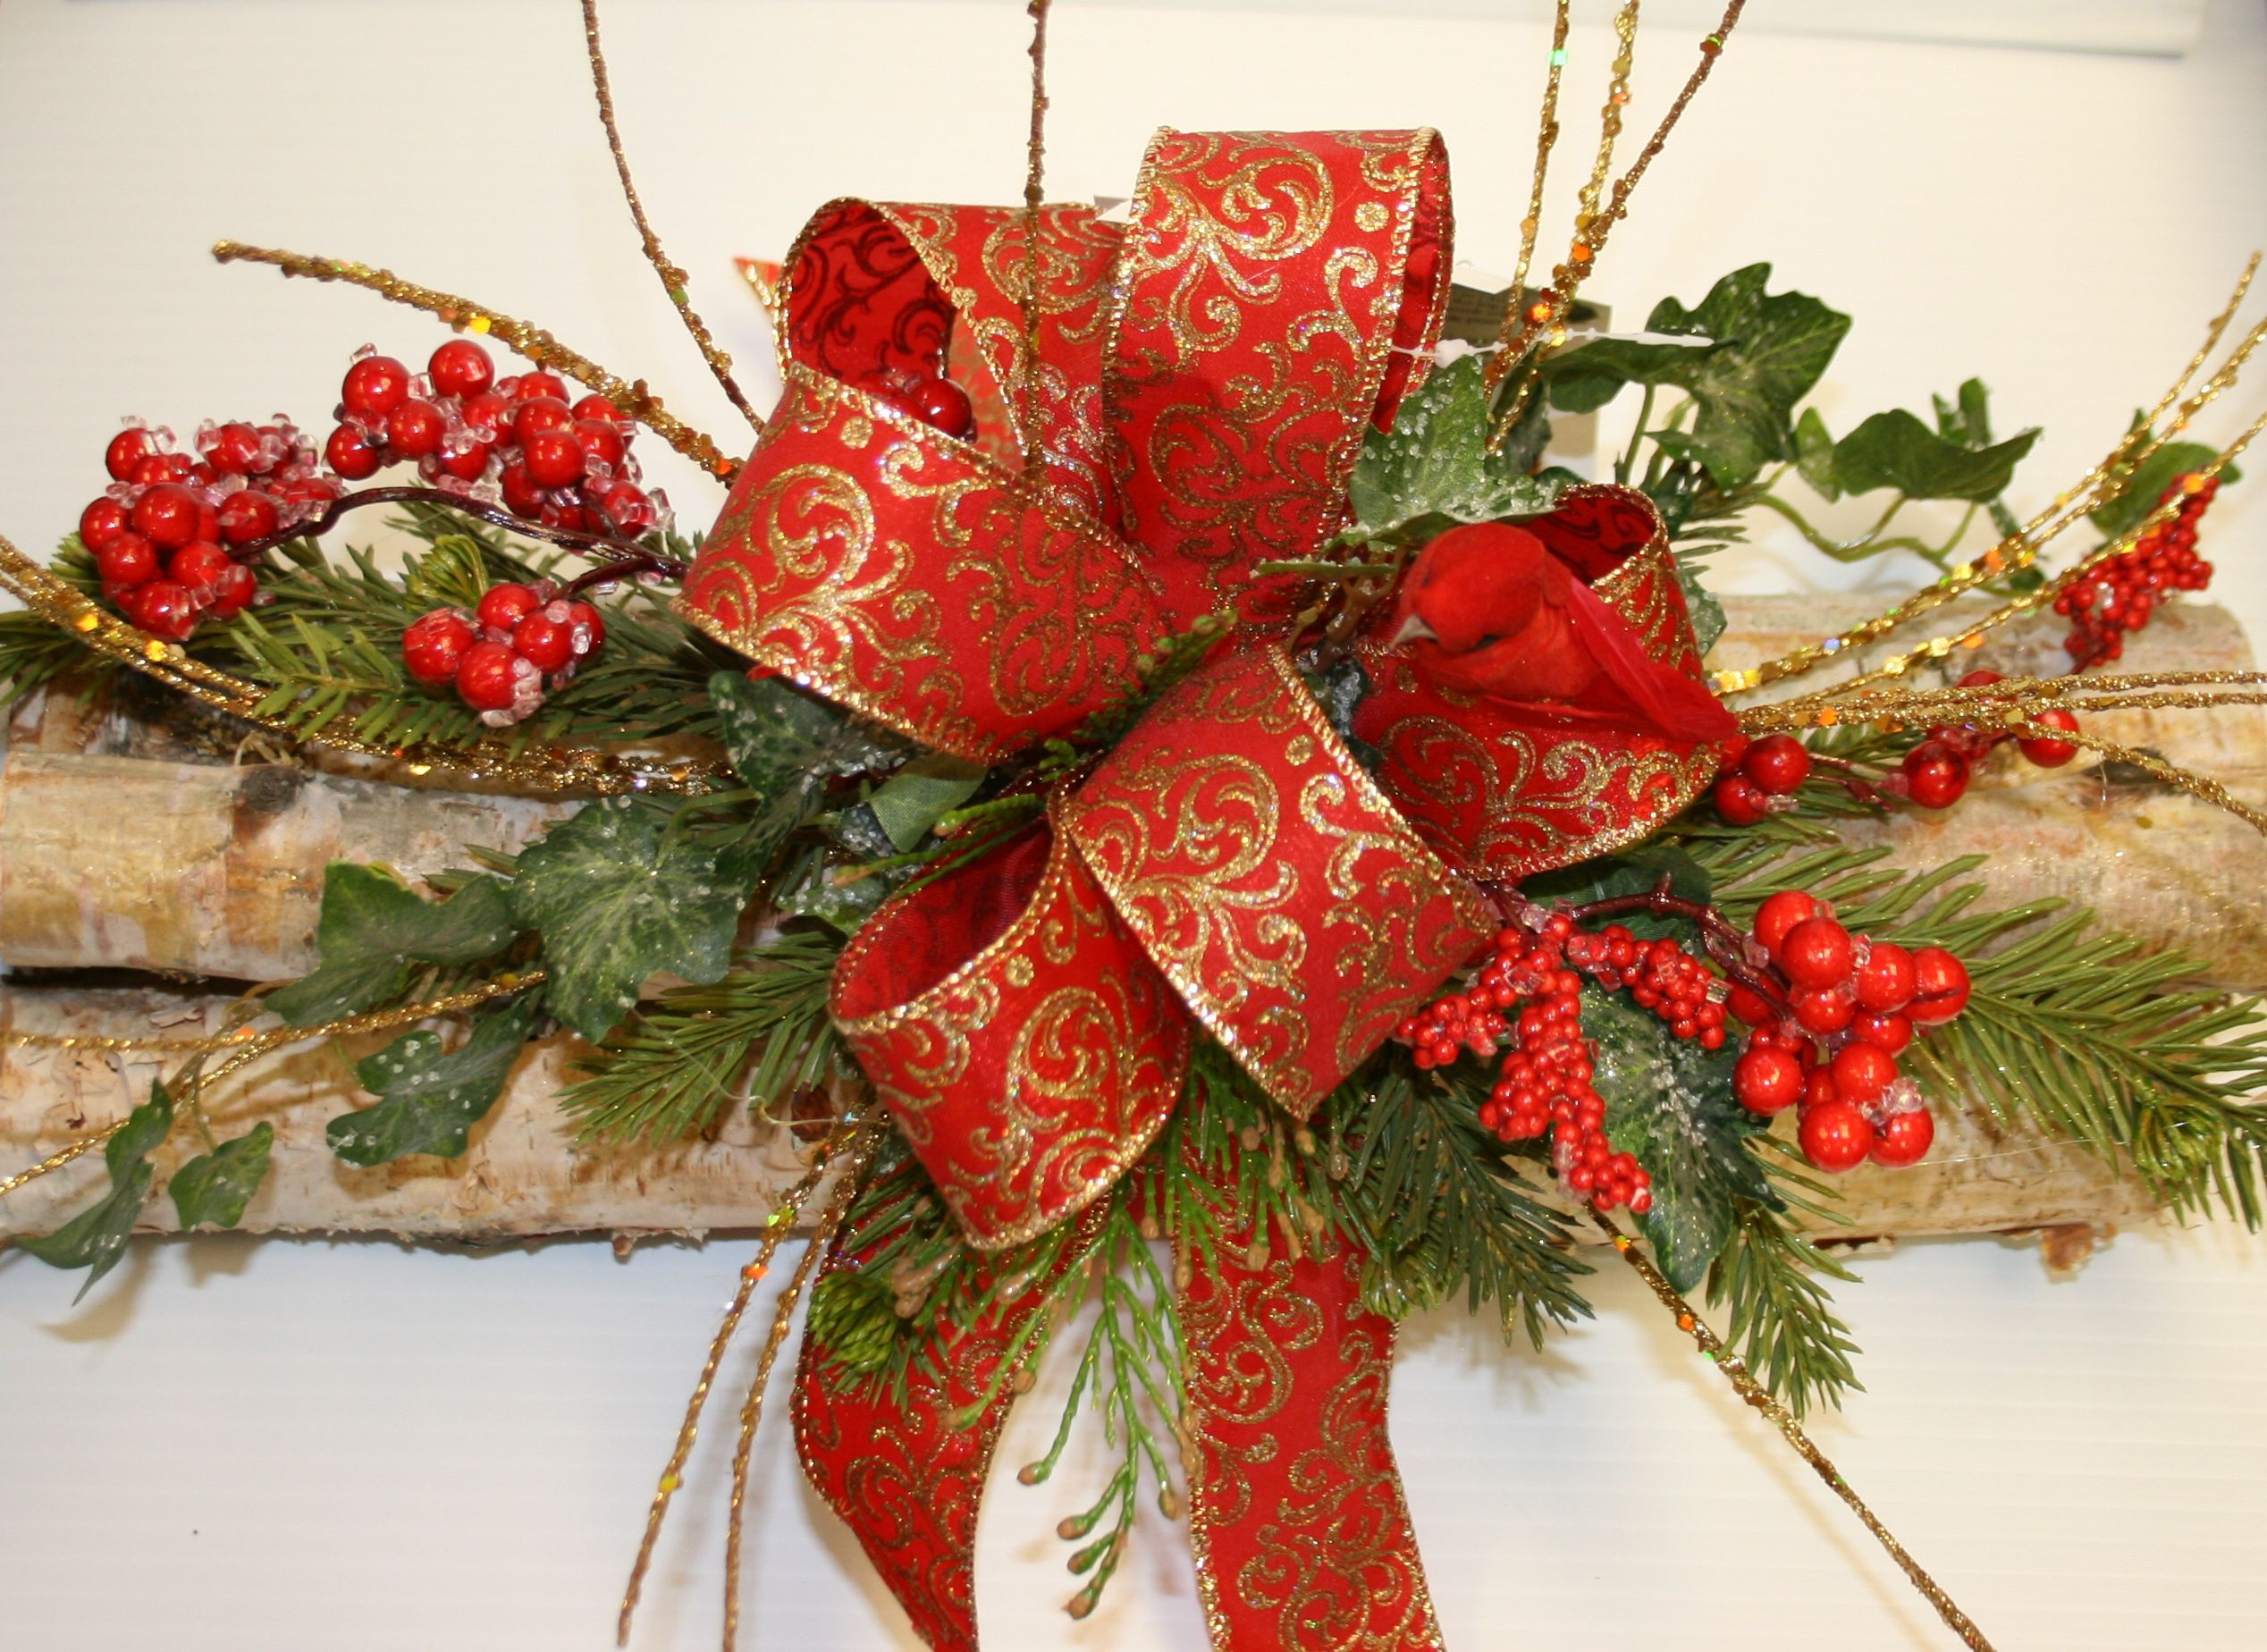 Log Christmas Centerpieces  Designer Made Decorative Yule Logs Make A  Great Centerpiece